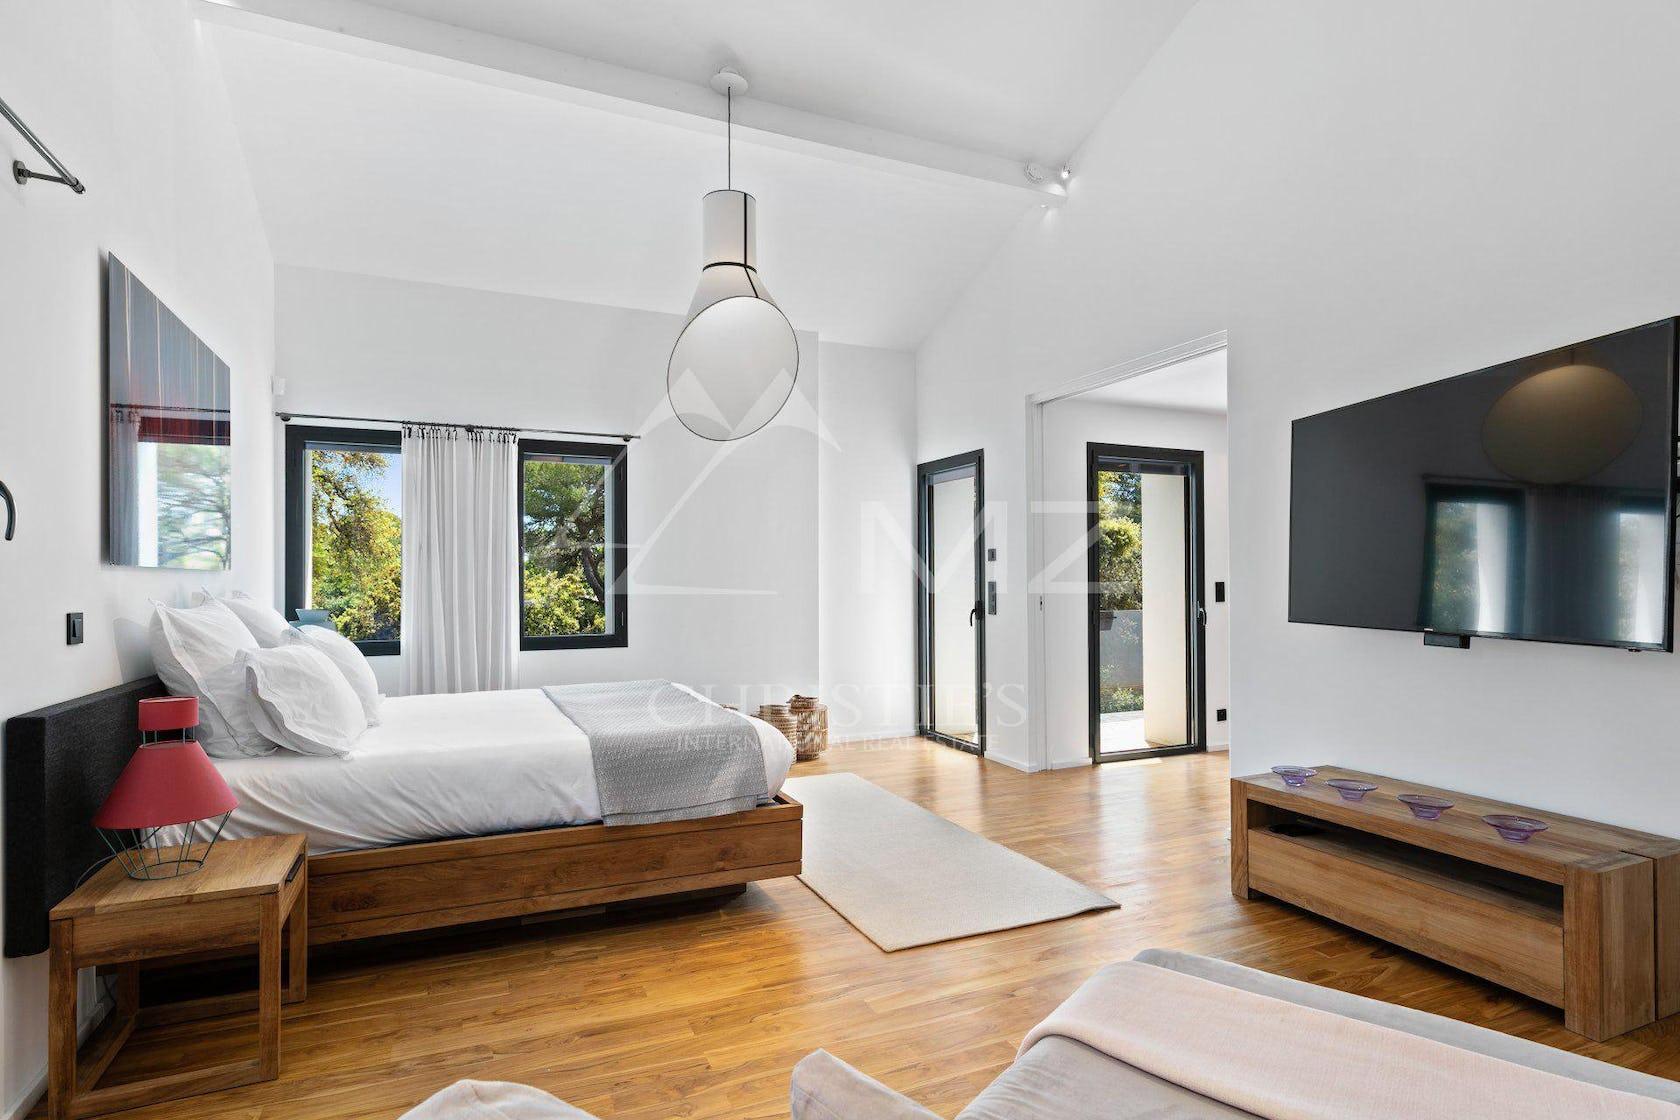 flooring interior design indoors bedroom room furniture wood floor hardwood